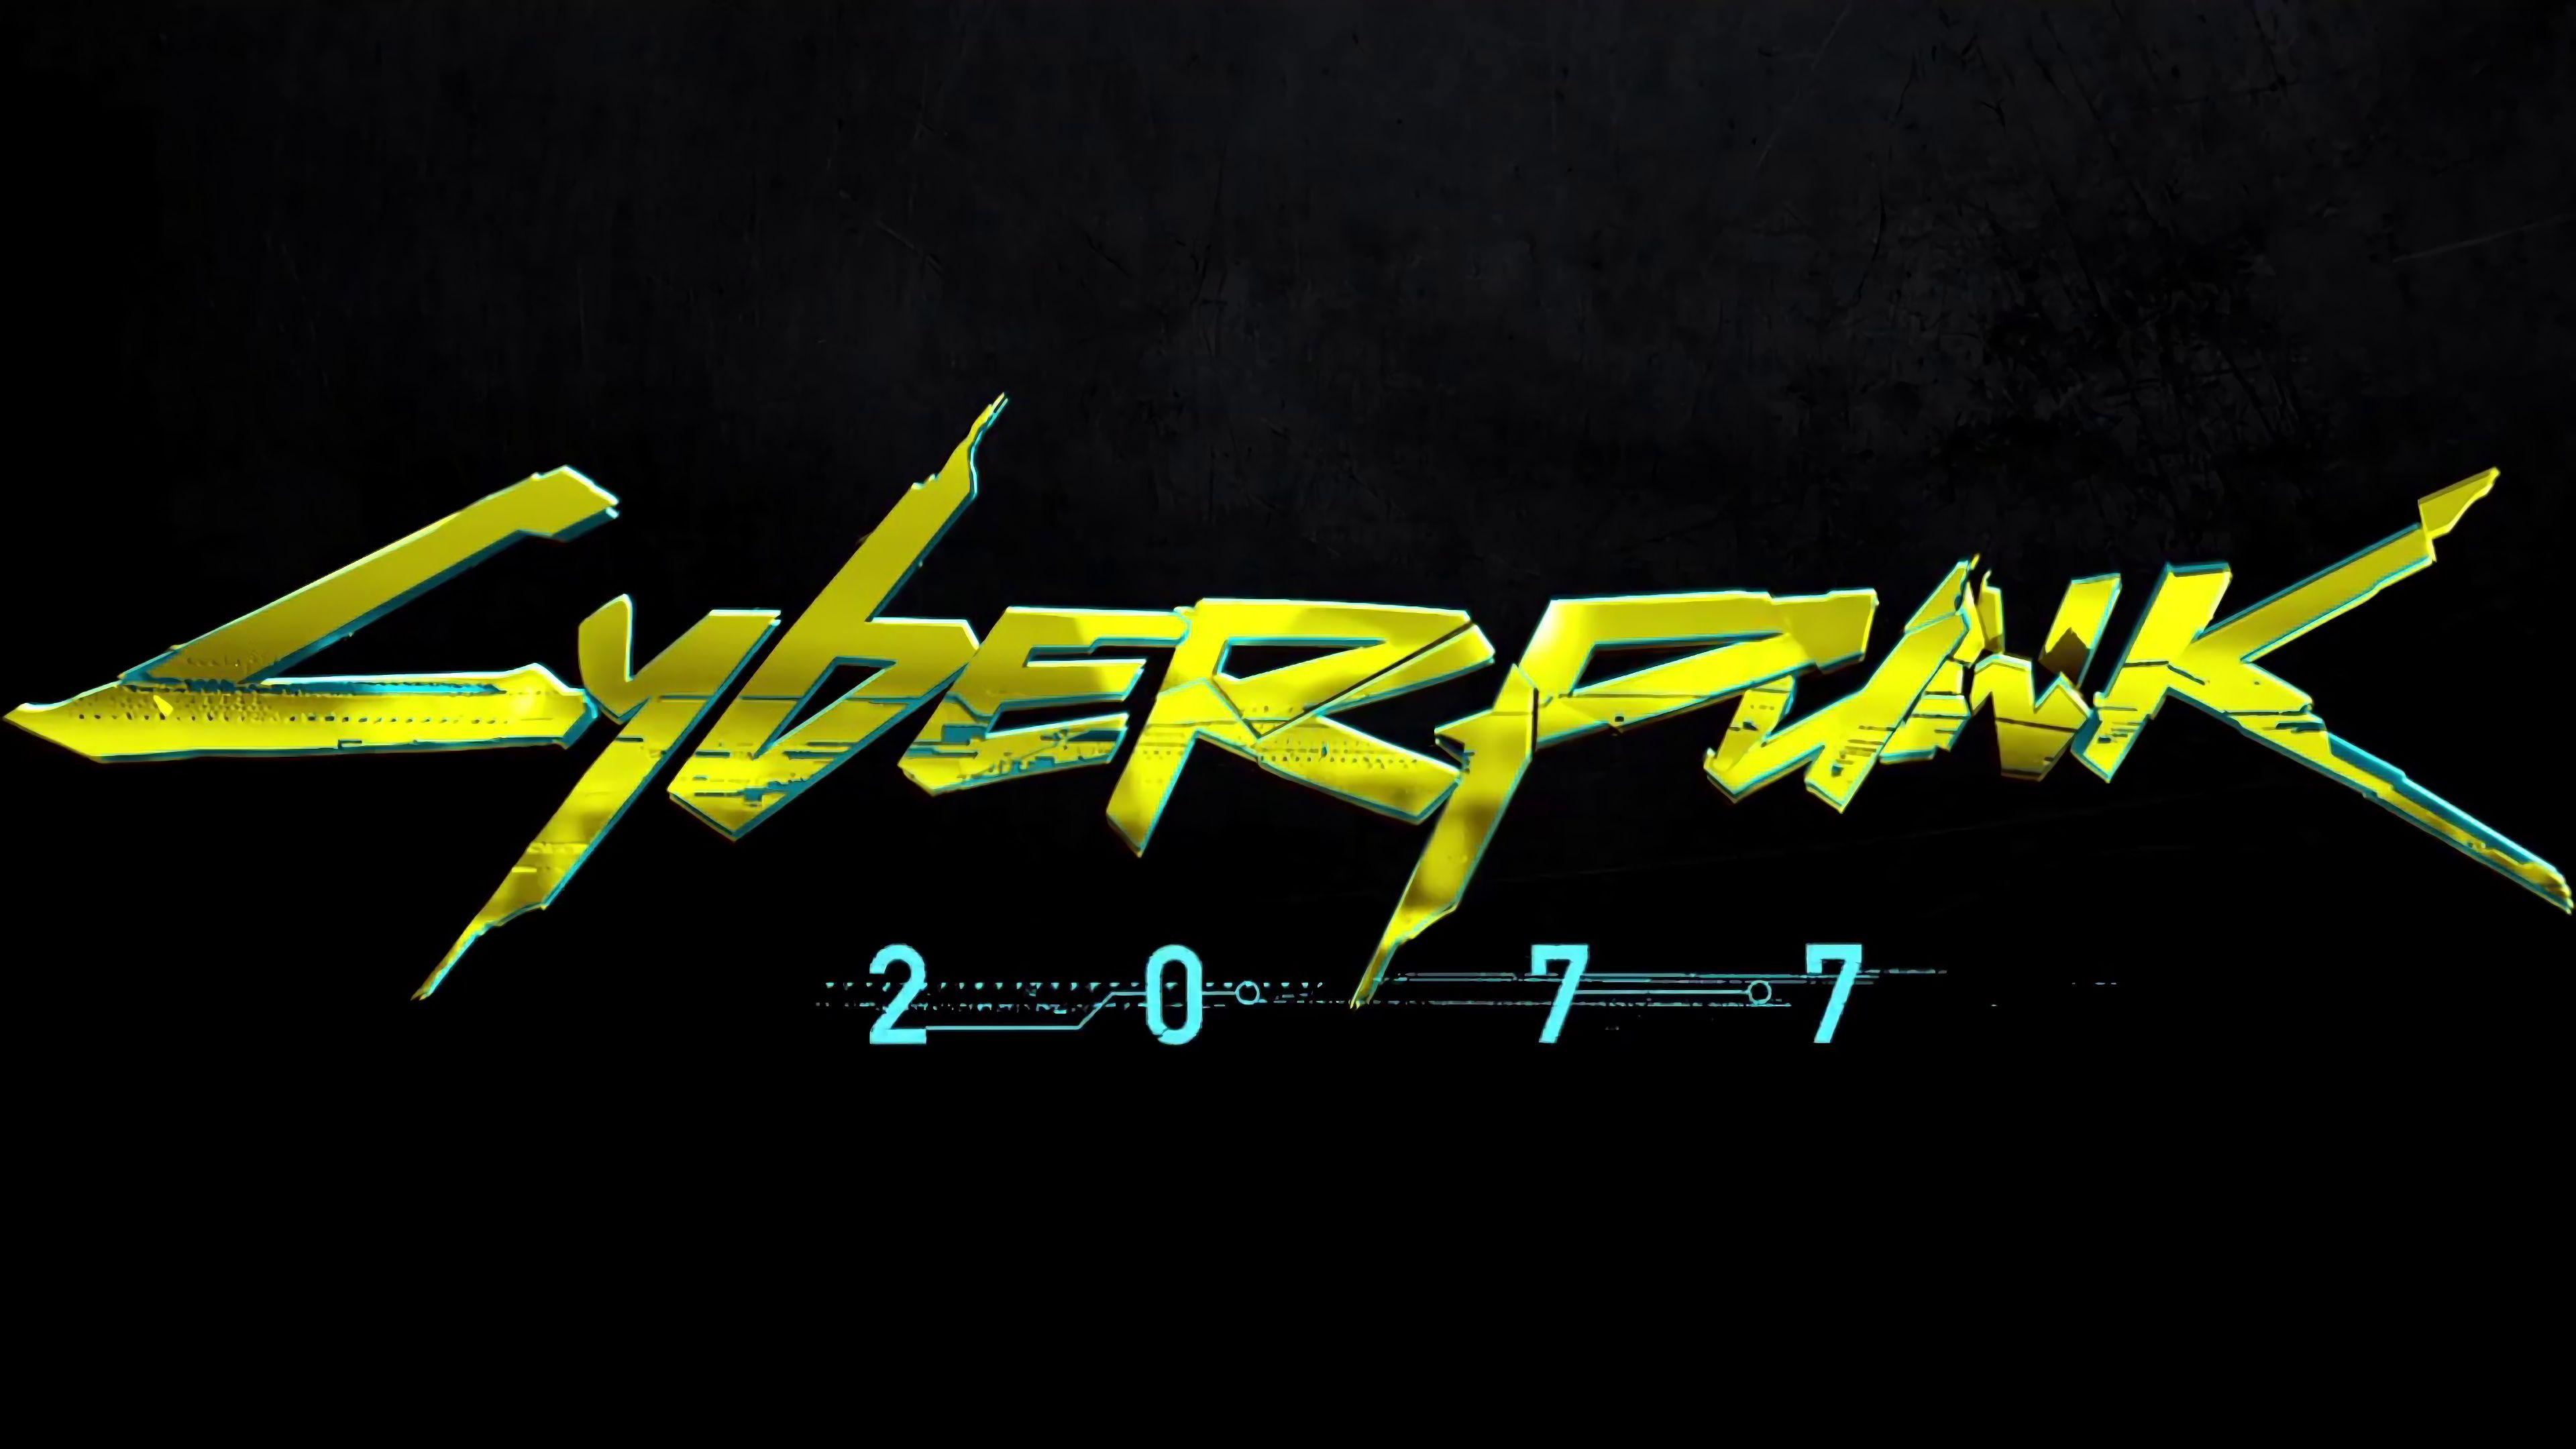 Cyberpunk 2077 Logo 4k 14744 Cyberpunk Cyberpunk 2077 Cyberpunk Girl